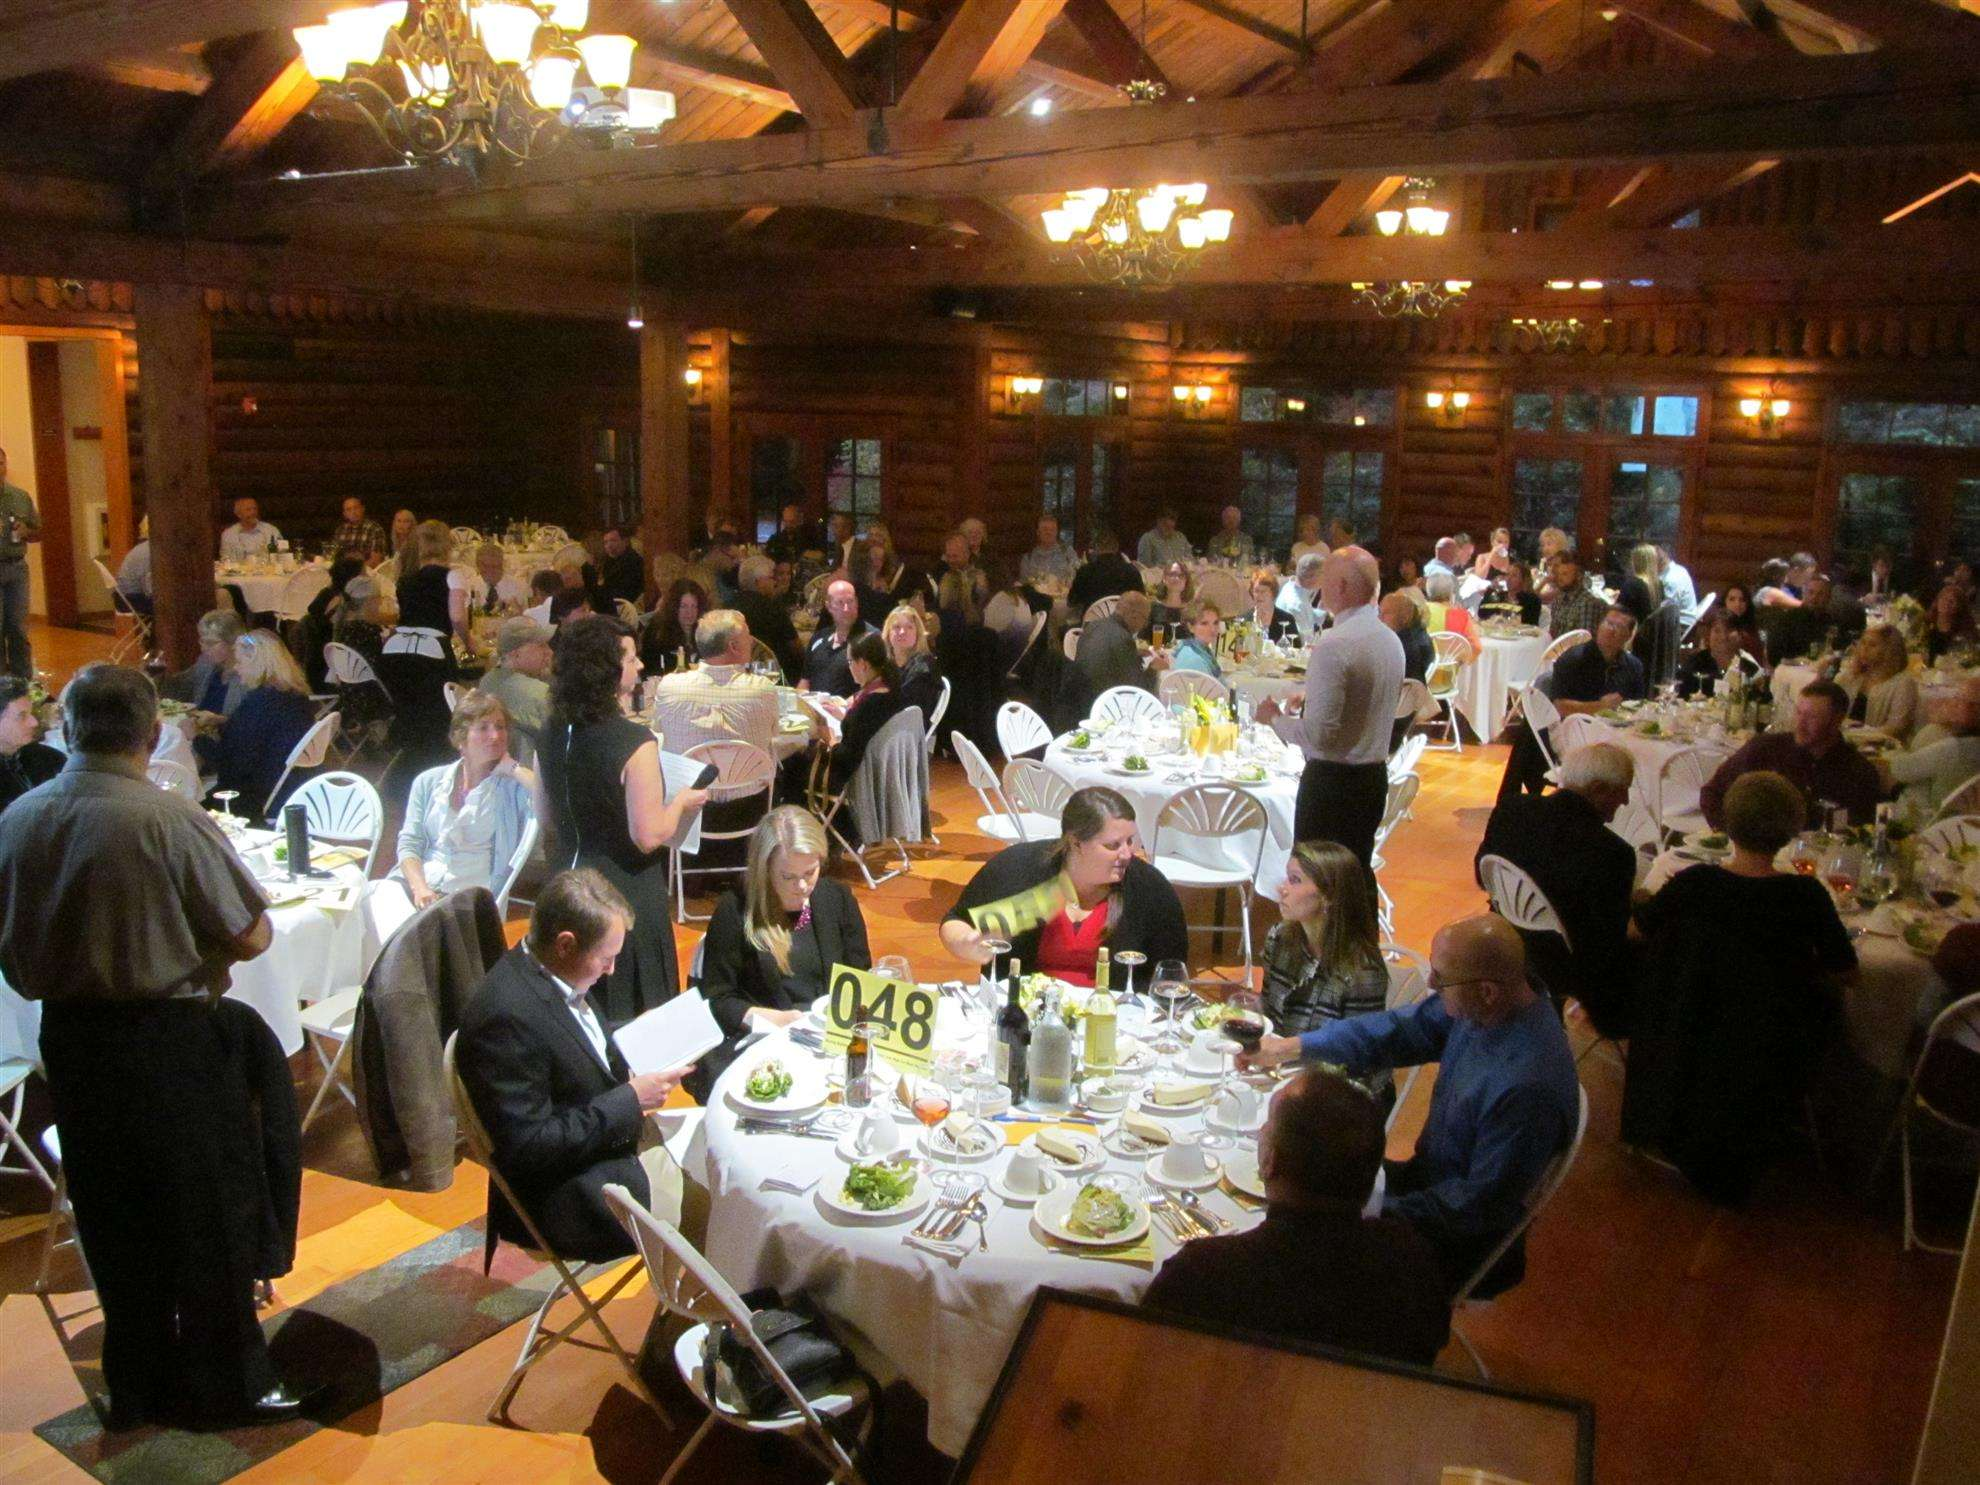 Rotary Club of Woodland